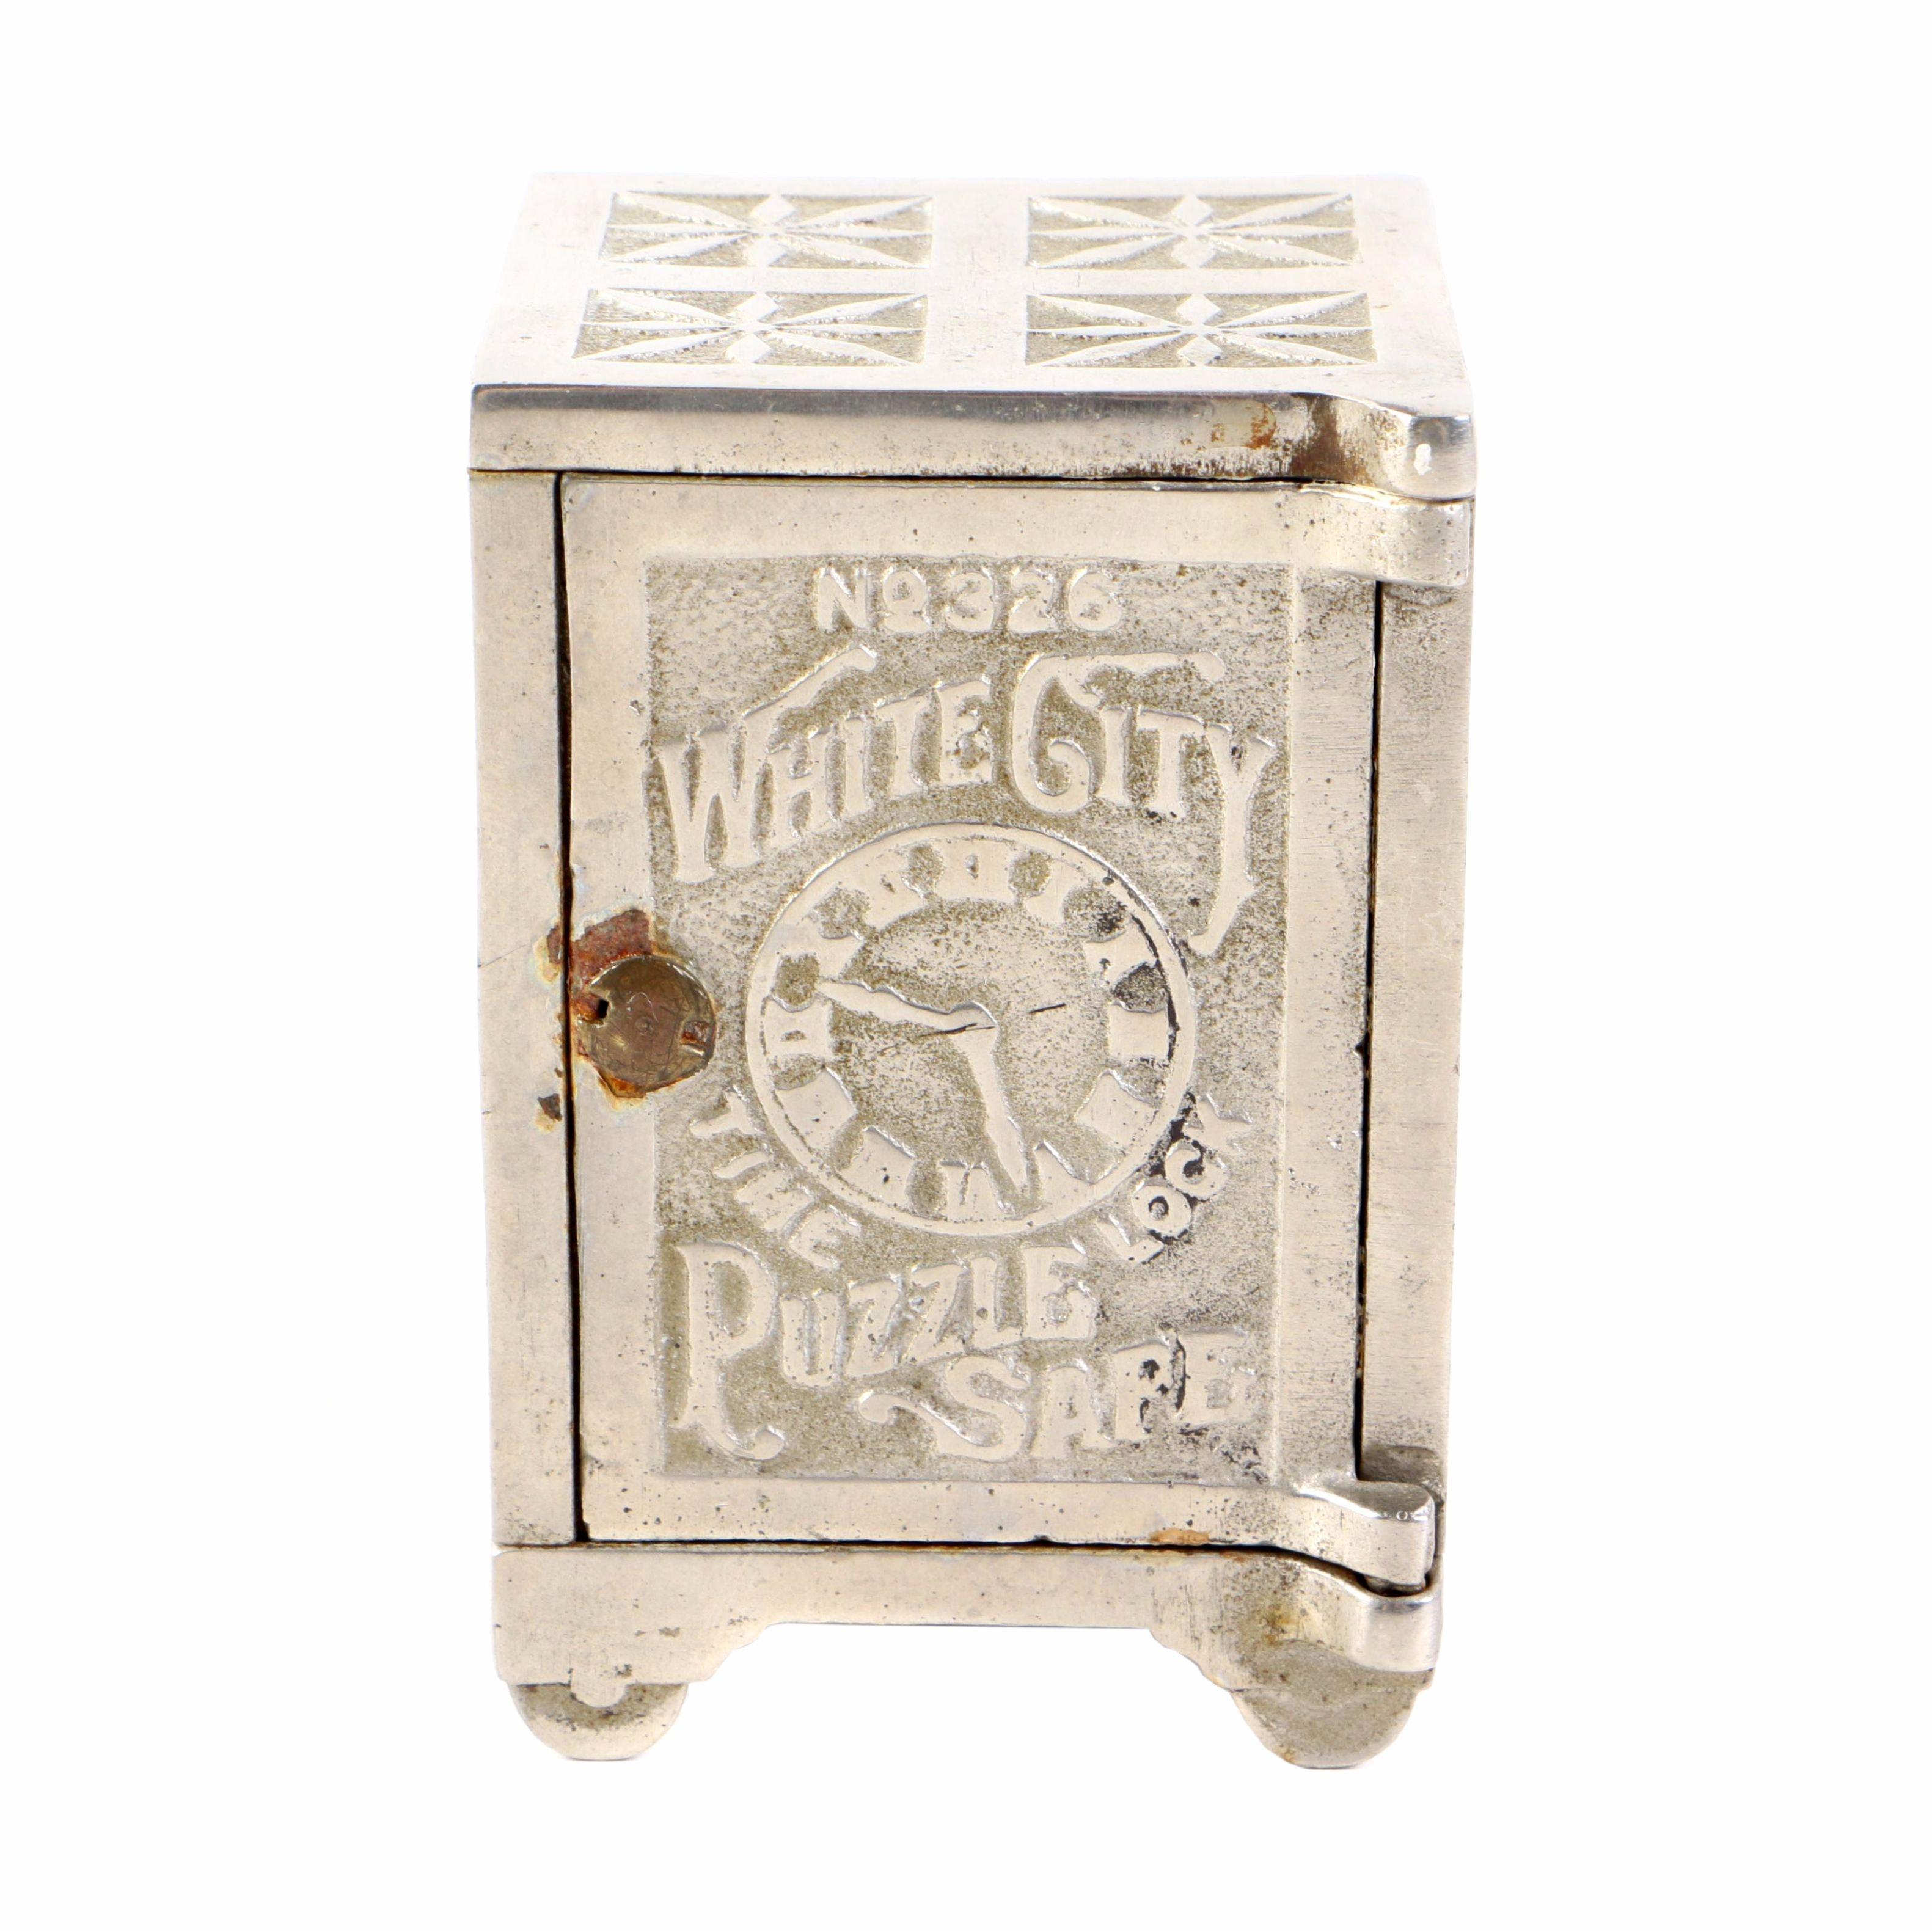 "Antique Nicol & Co. ""White City Puzzle Safe No. 326"" Still Bank"